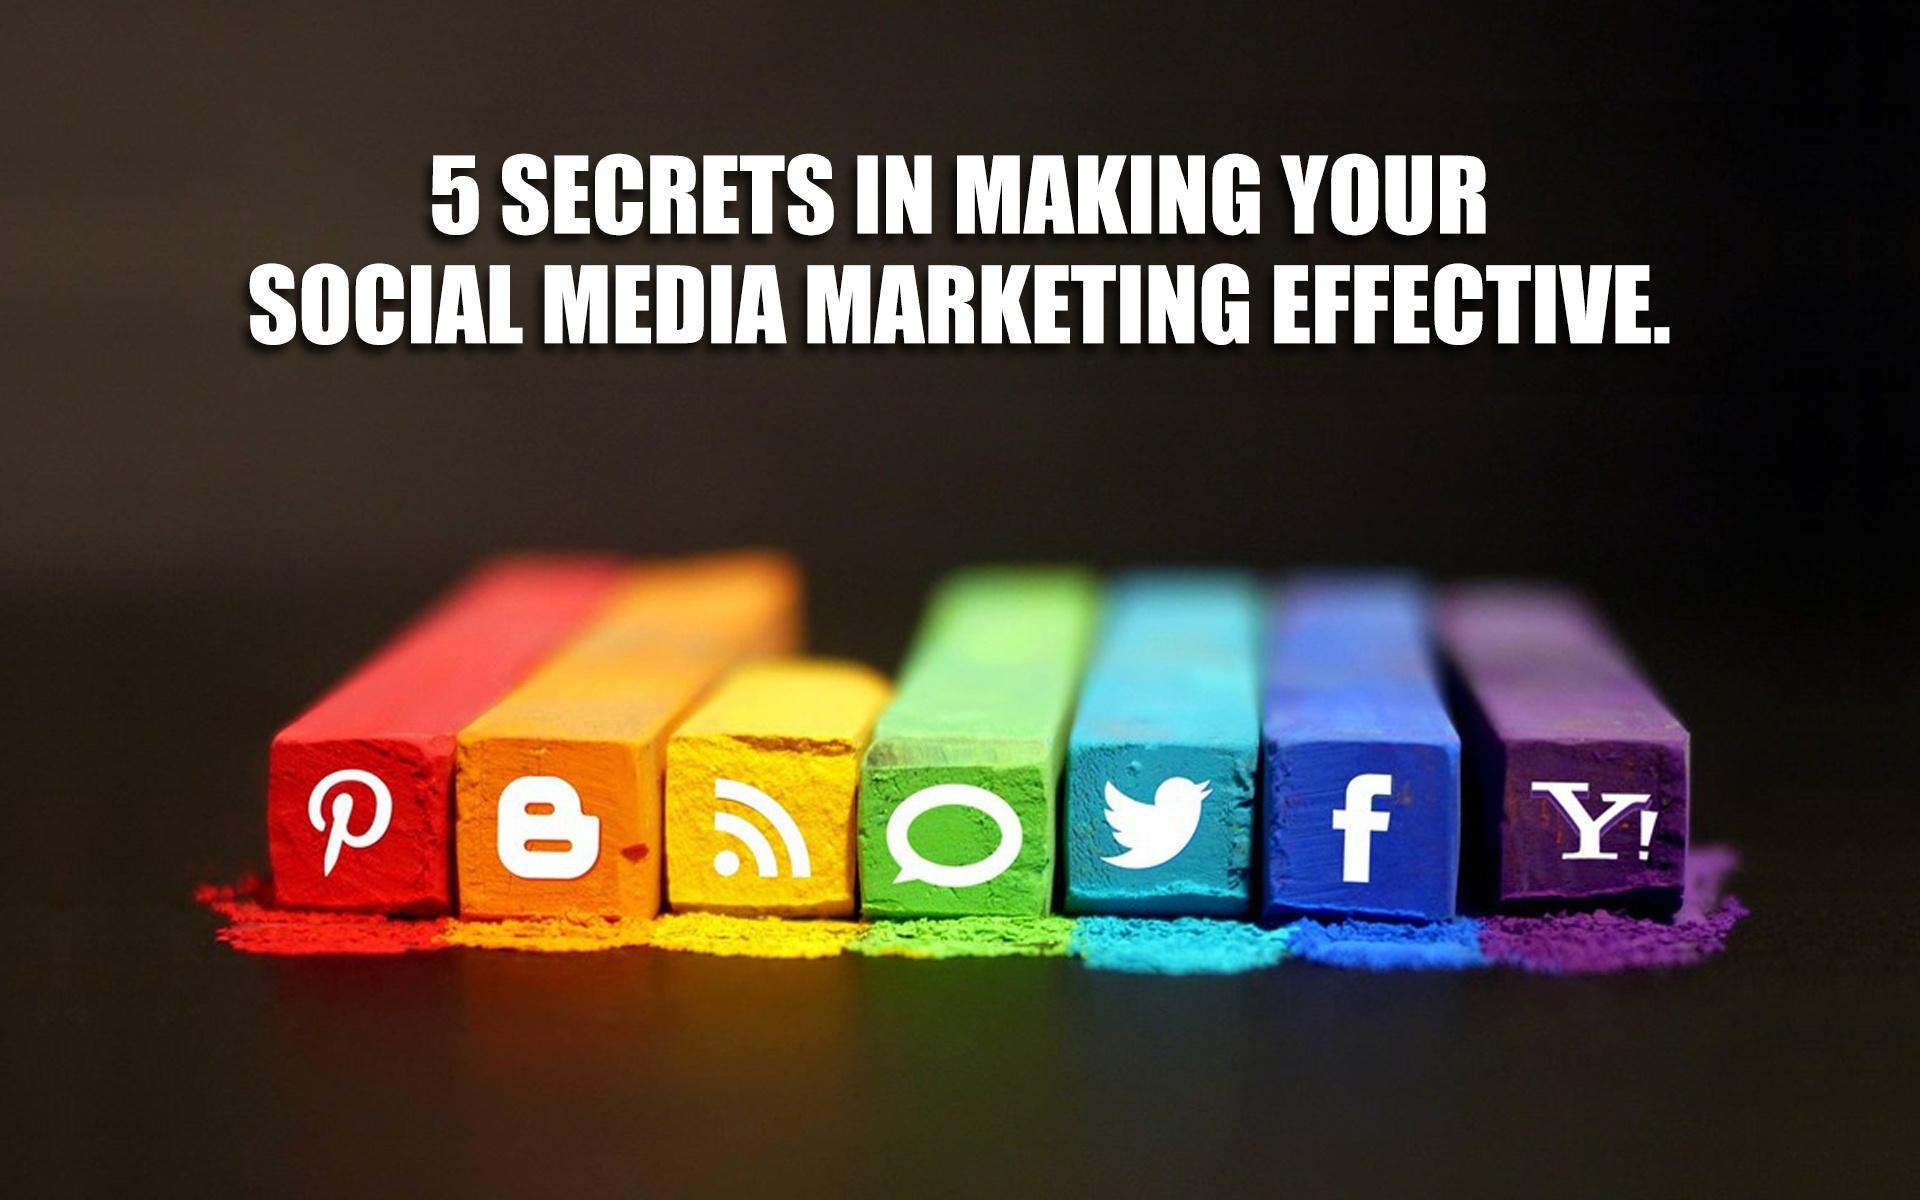 5 Secrets in Making Your Social Media Marketing Effective